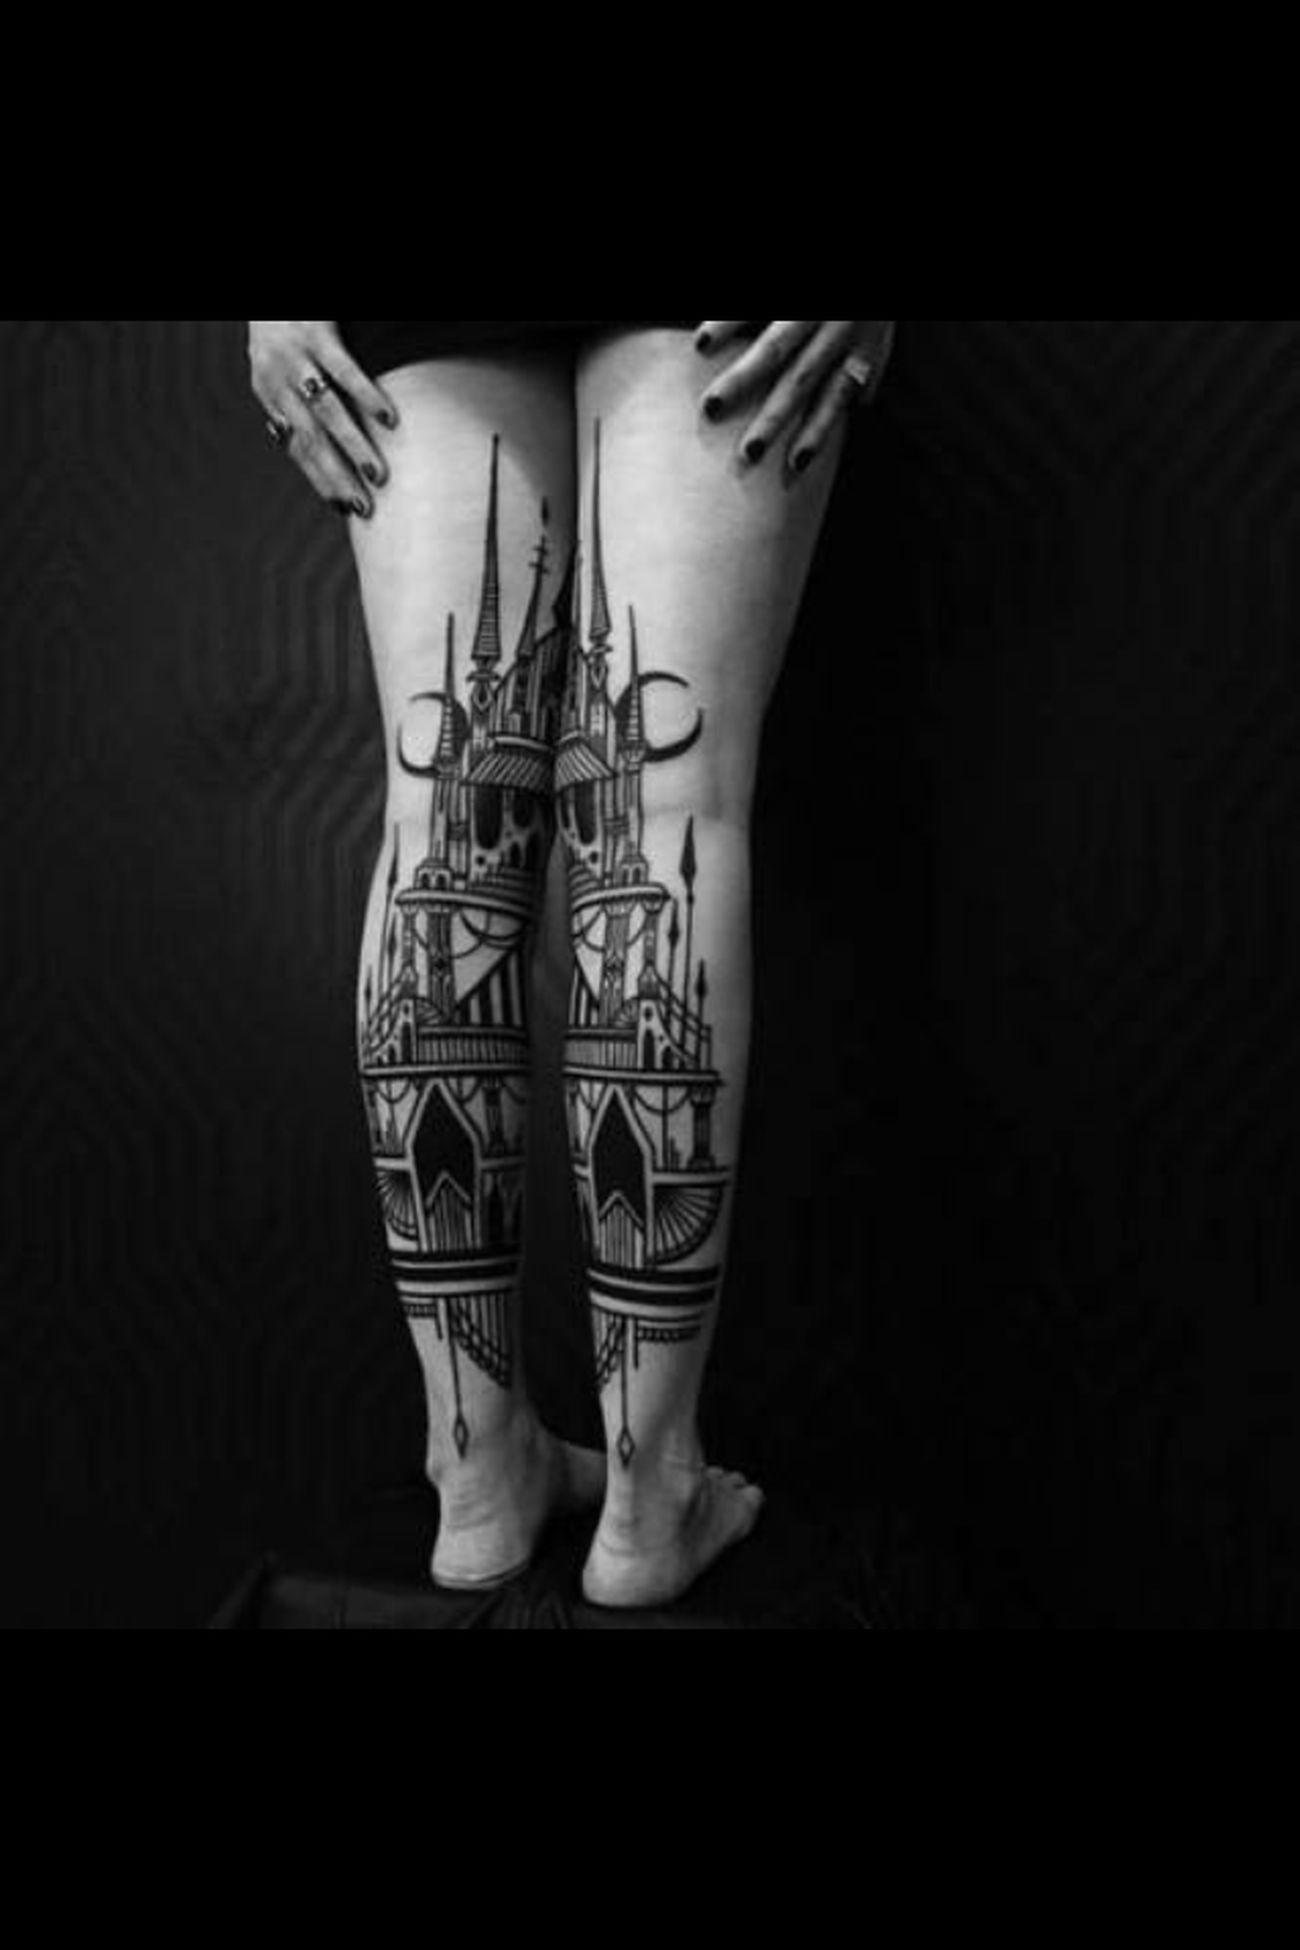 Stunning Disney Lovely Ink Tattooed Bodyart Inked Inkedgirls Tattoo Greatwork Amazing Legs Black Getting Inspired